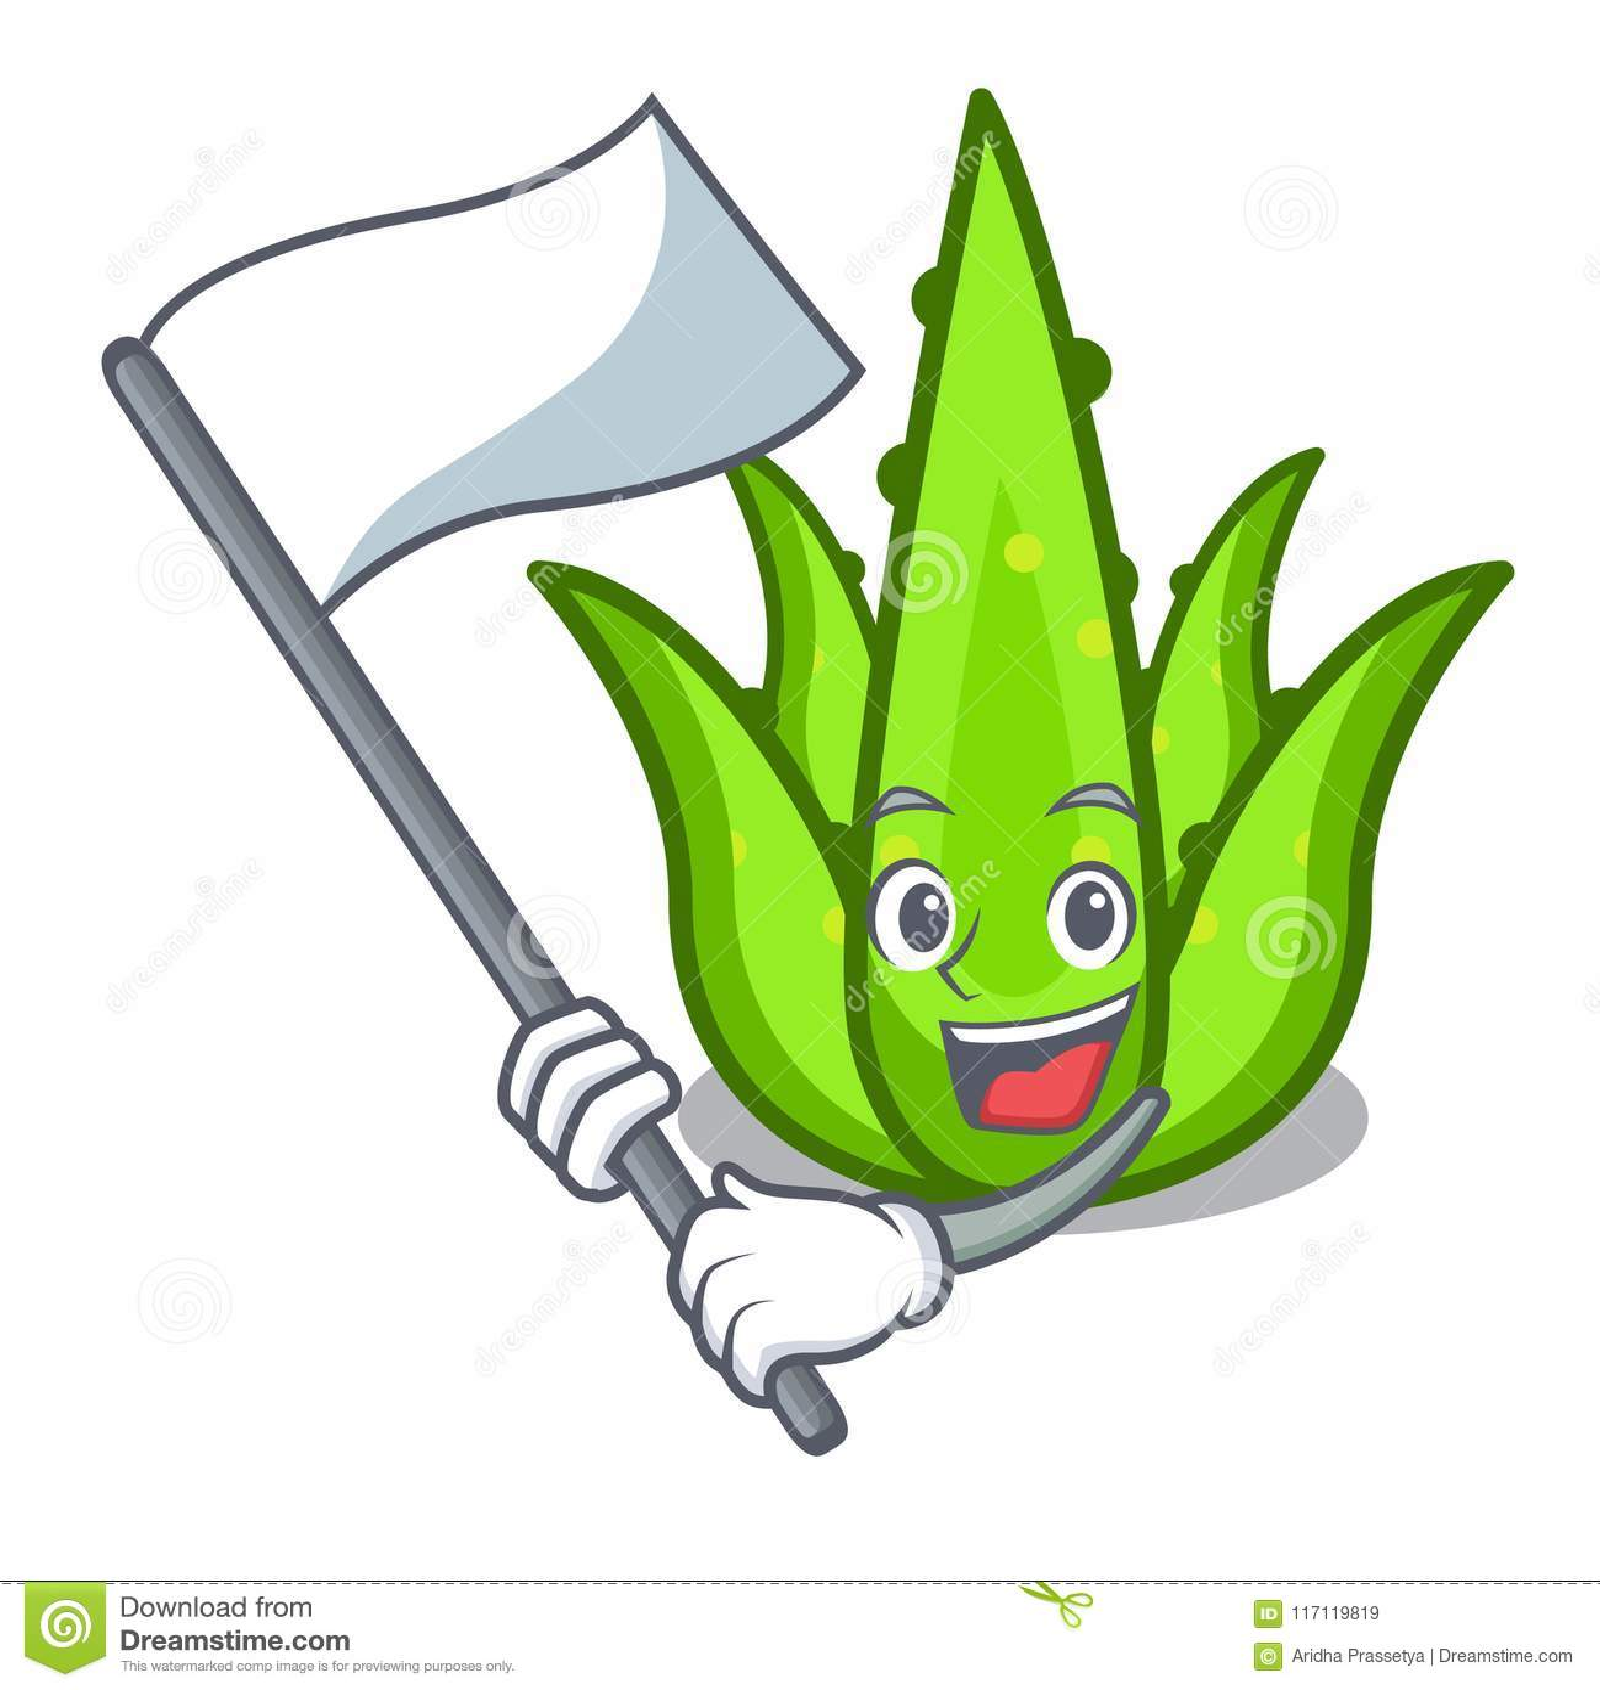 With flag aloevera mascot cartoon style